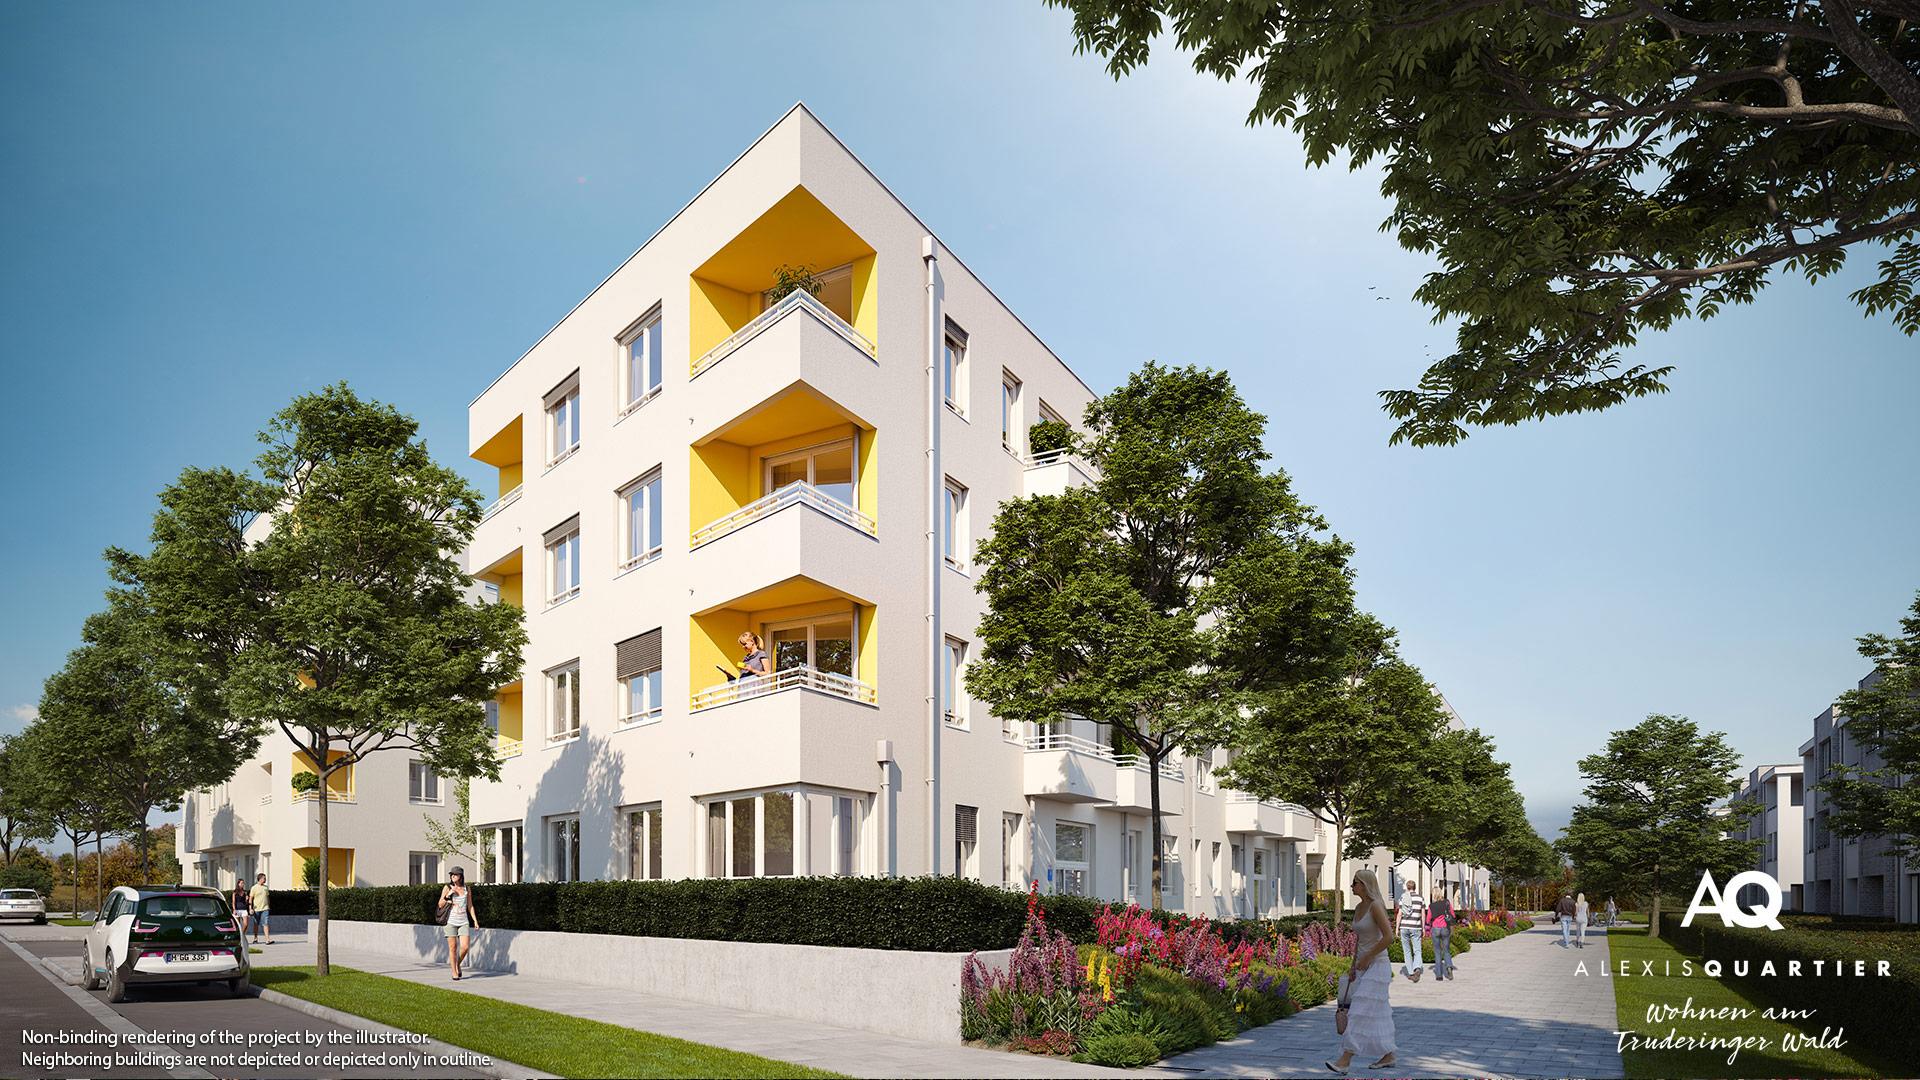 Property Alexisquartier - Wohnen am Truderinger Wald - Illustration 3